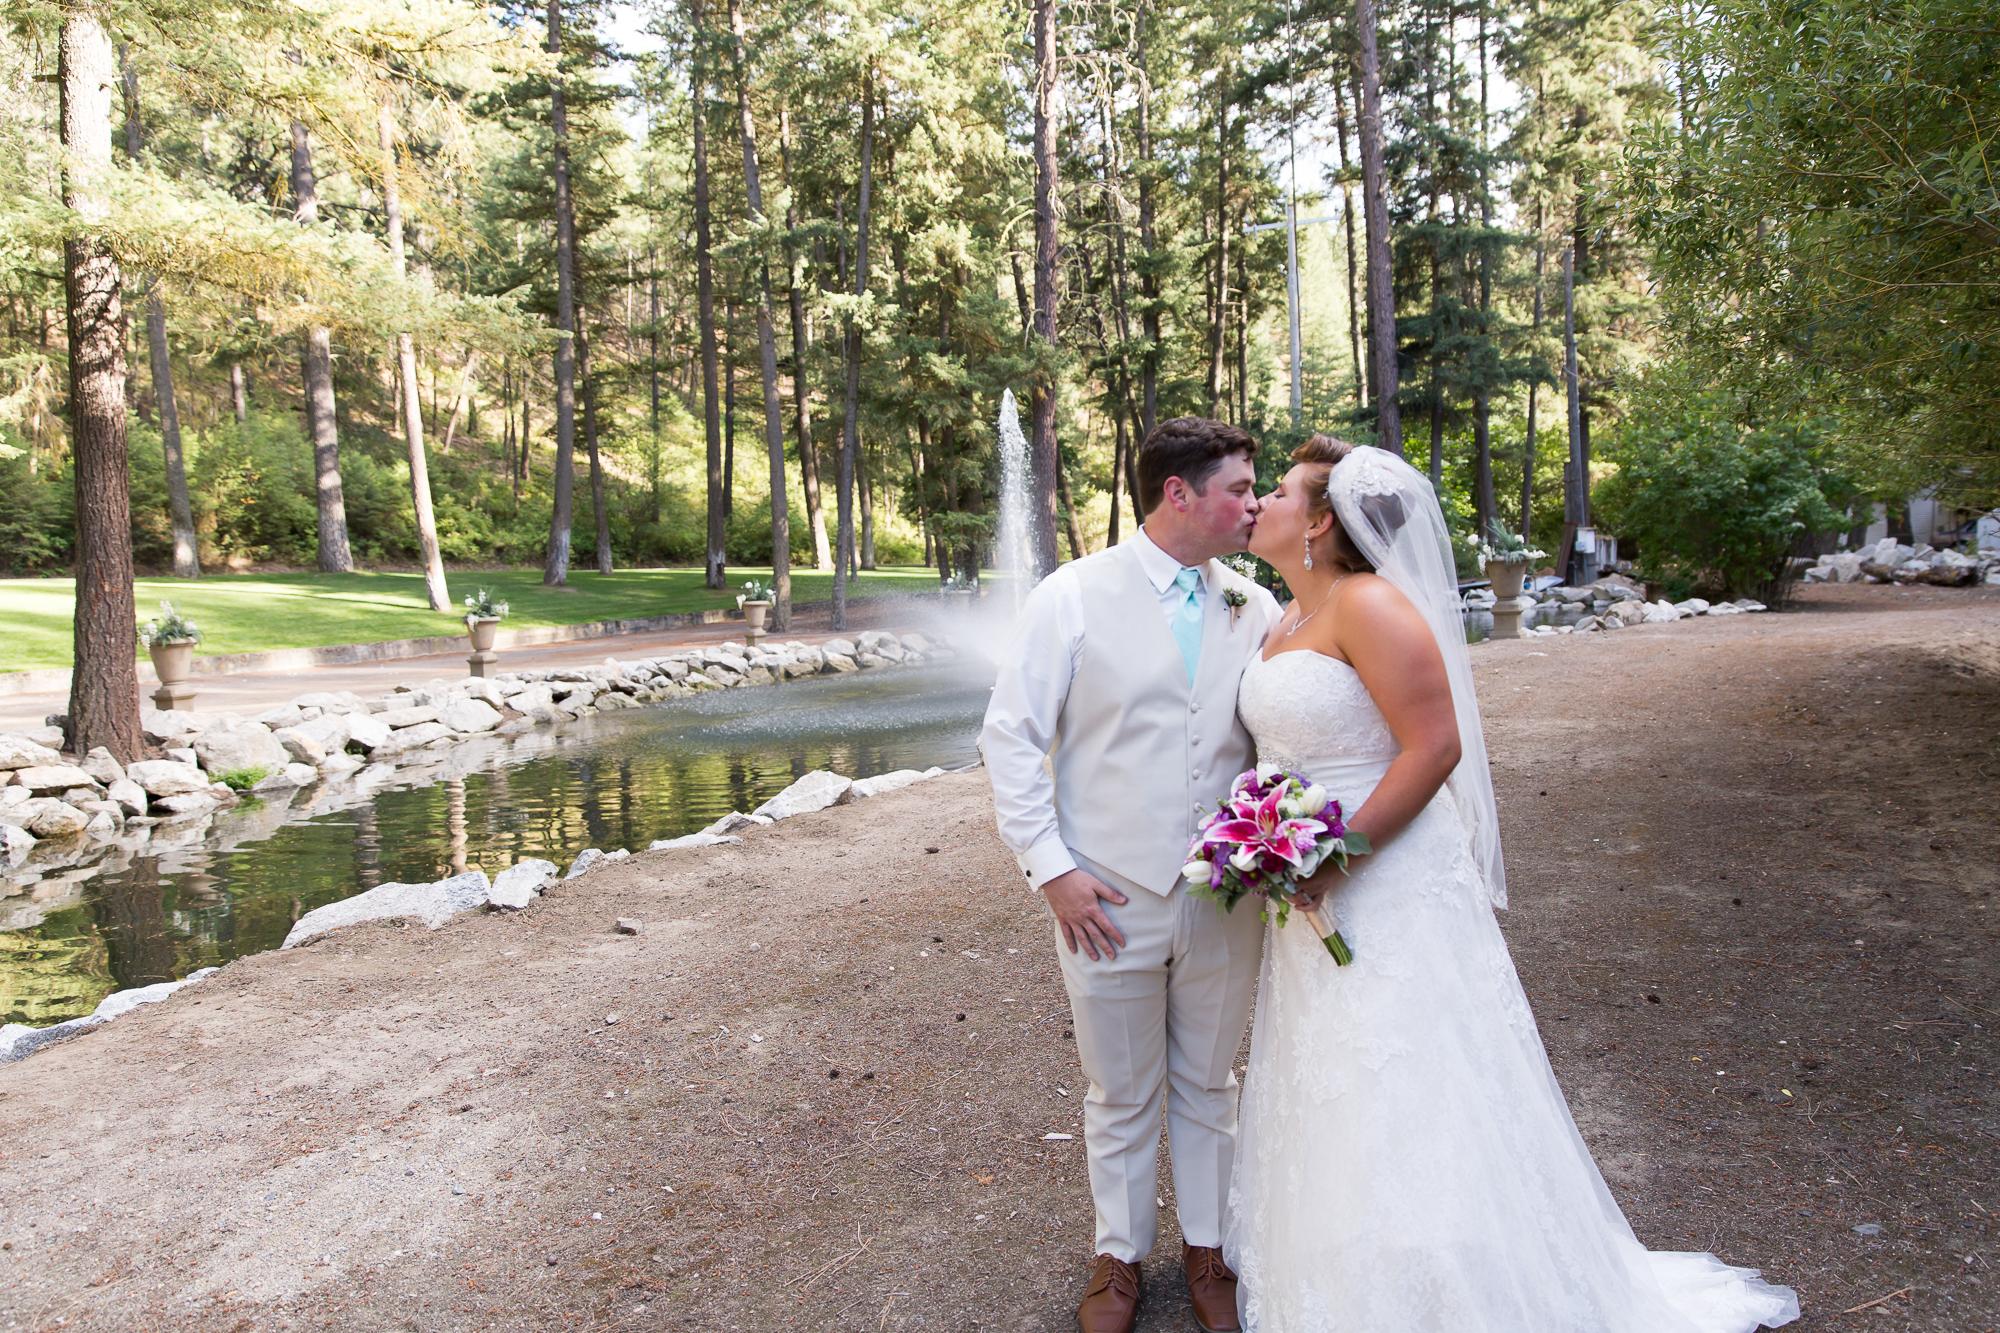 Great Gatsby Wedding, Hanson Wedding, Commellini Estate, Brides, Grooms, Bride & Groom, Spokane Wedding, Best of Spokane Weddings, Weddings, Commellini